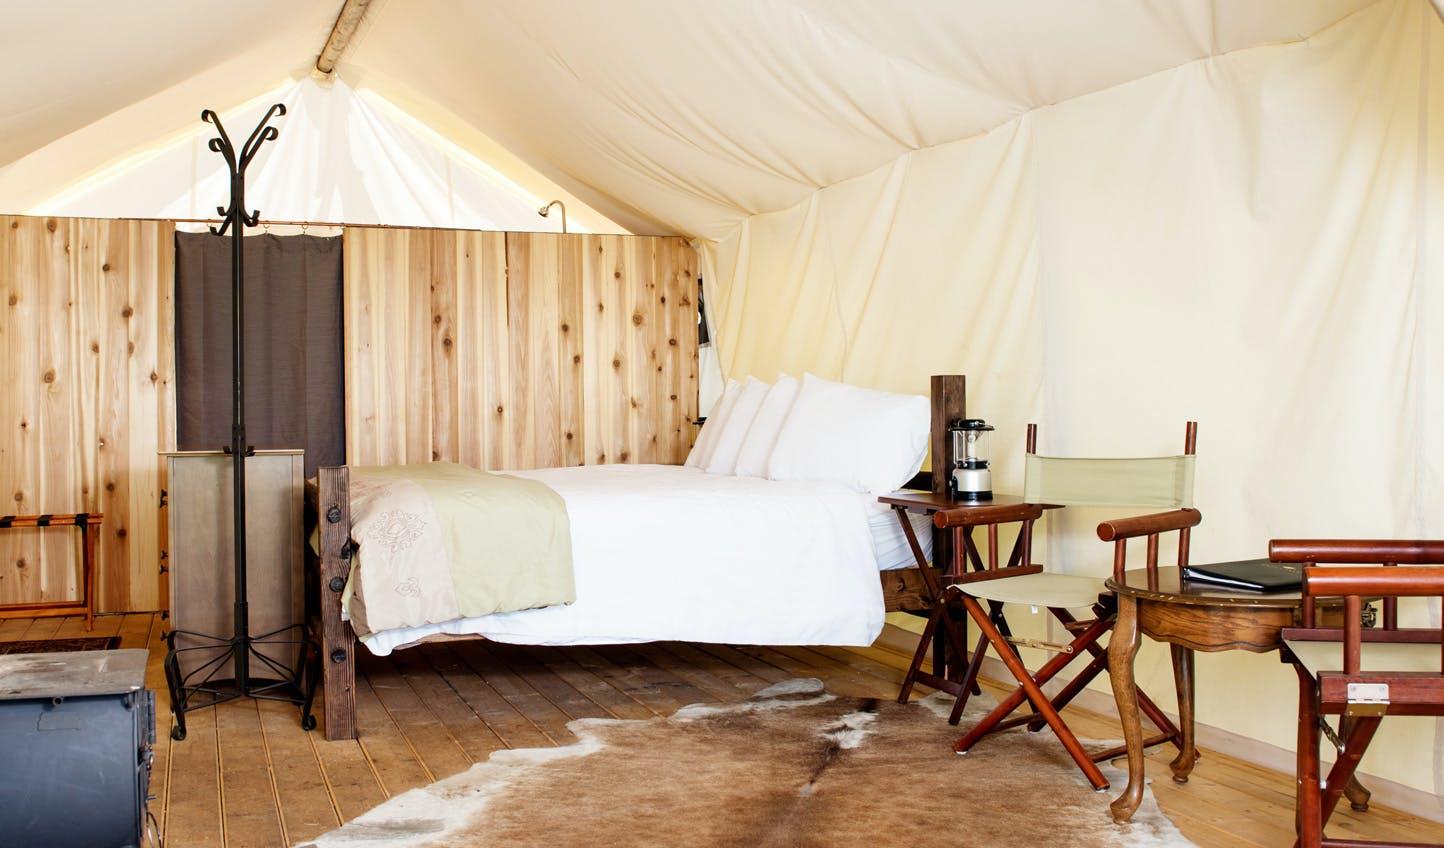 Luxury vacations to Yellowstone